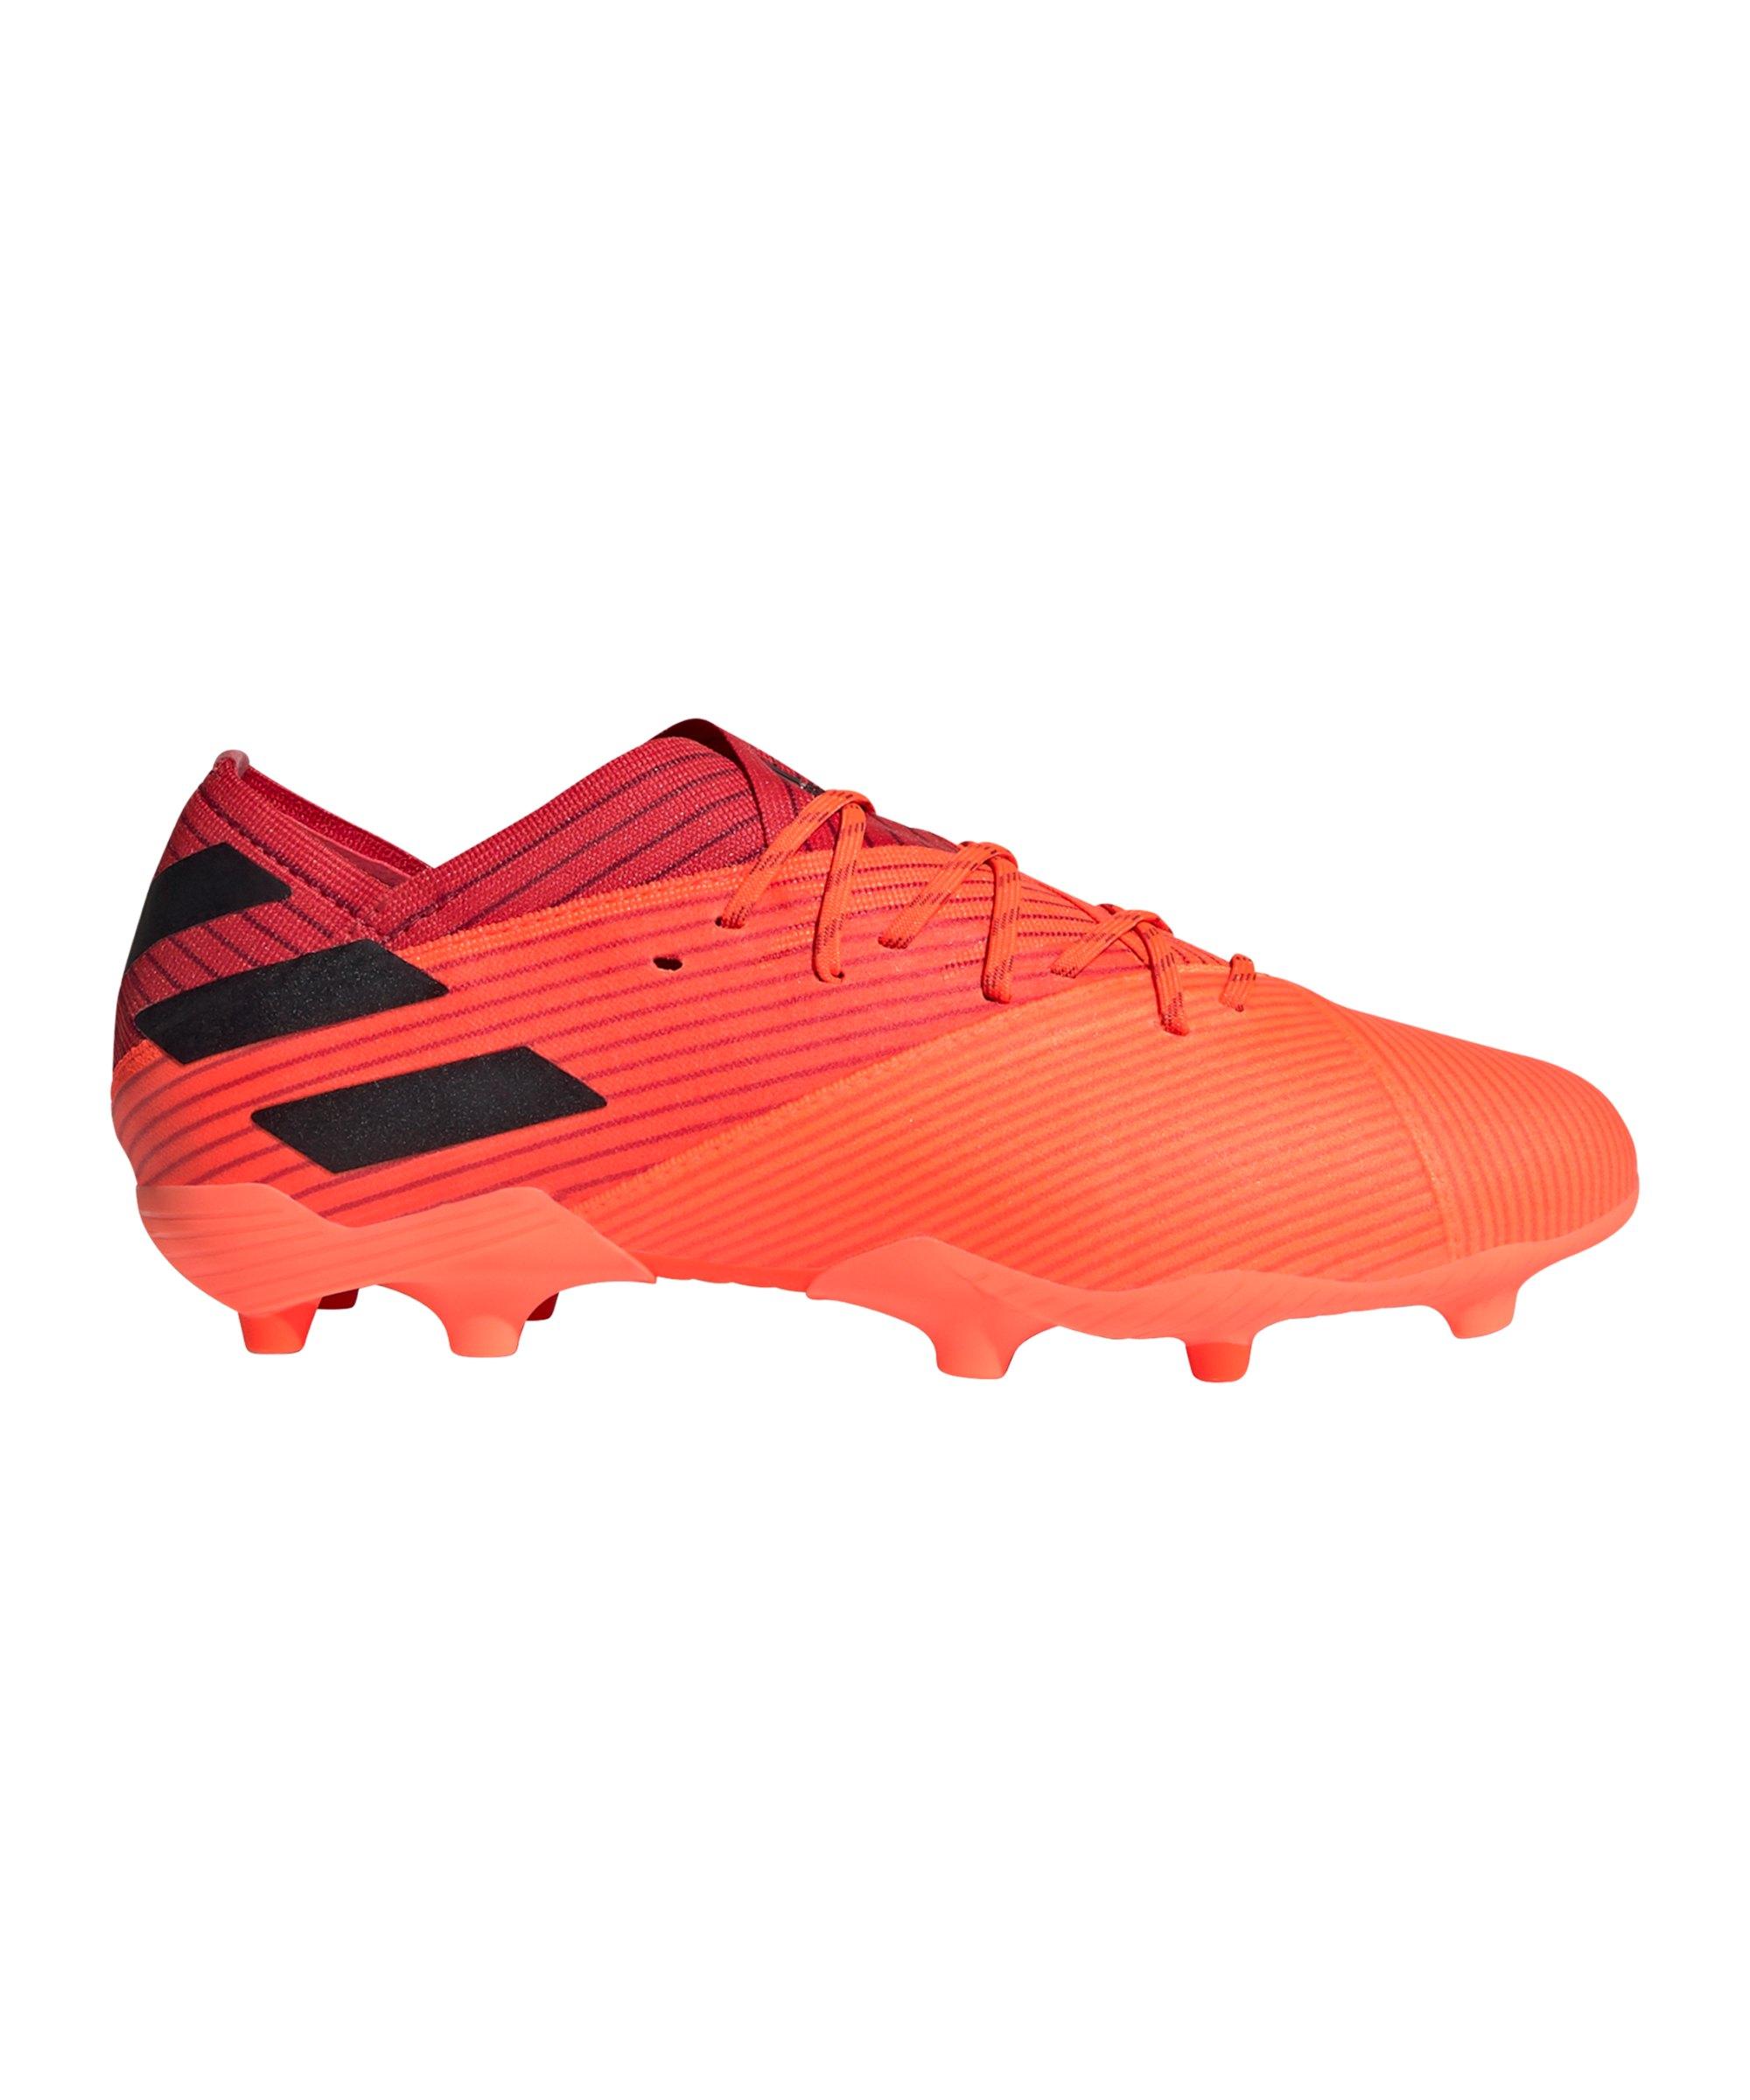 adidas NEMEZIZ Inflight 19.1 FG J Kids Orange - orange